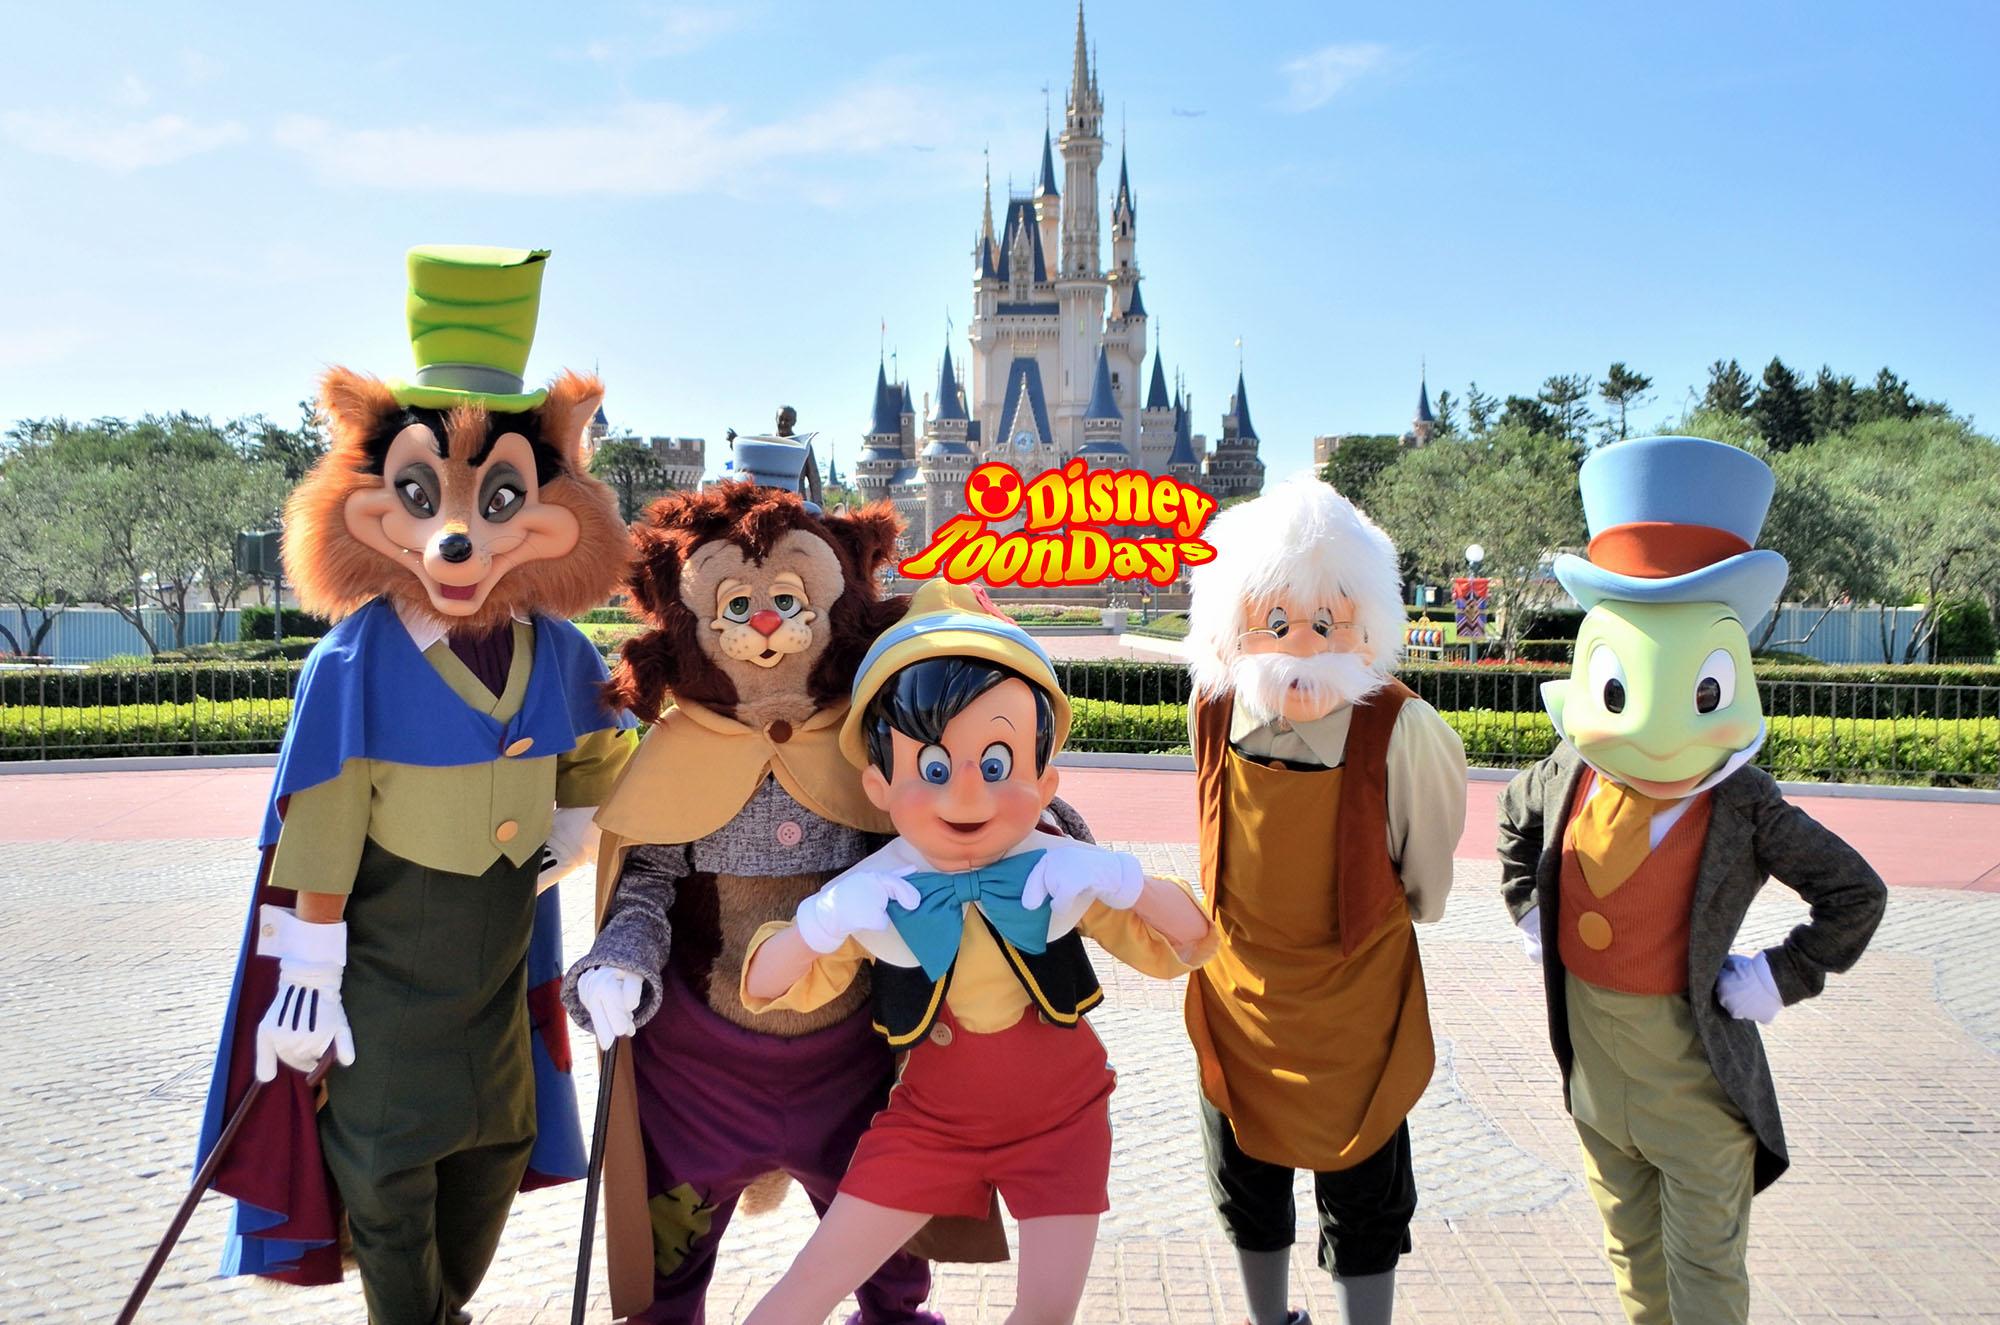 TDL 東京ディズニーランドハッピー15エントリー ピノキオと仲間たち